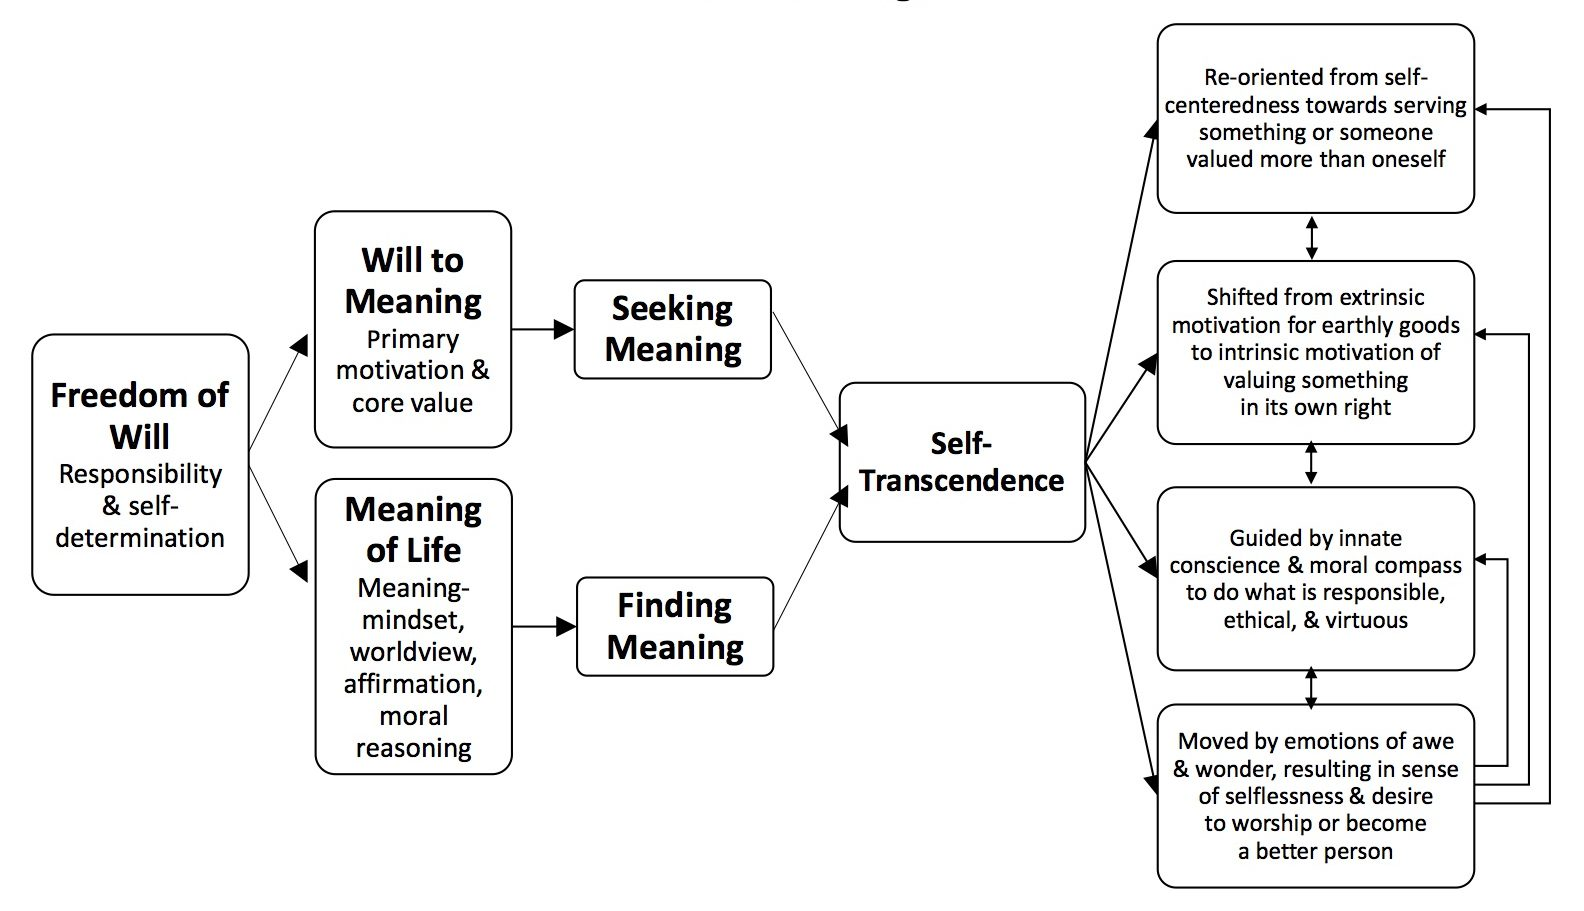 Frankl S Self Transcendence Model And Virtue Ethics